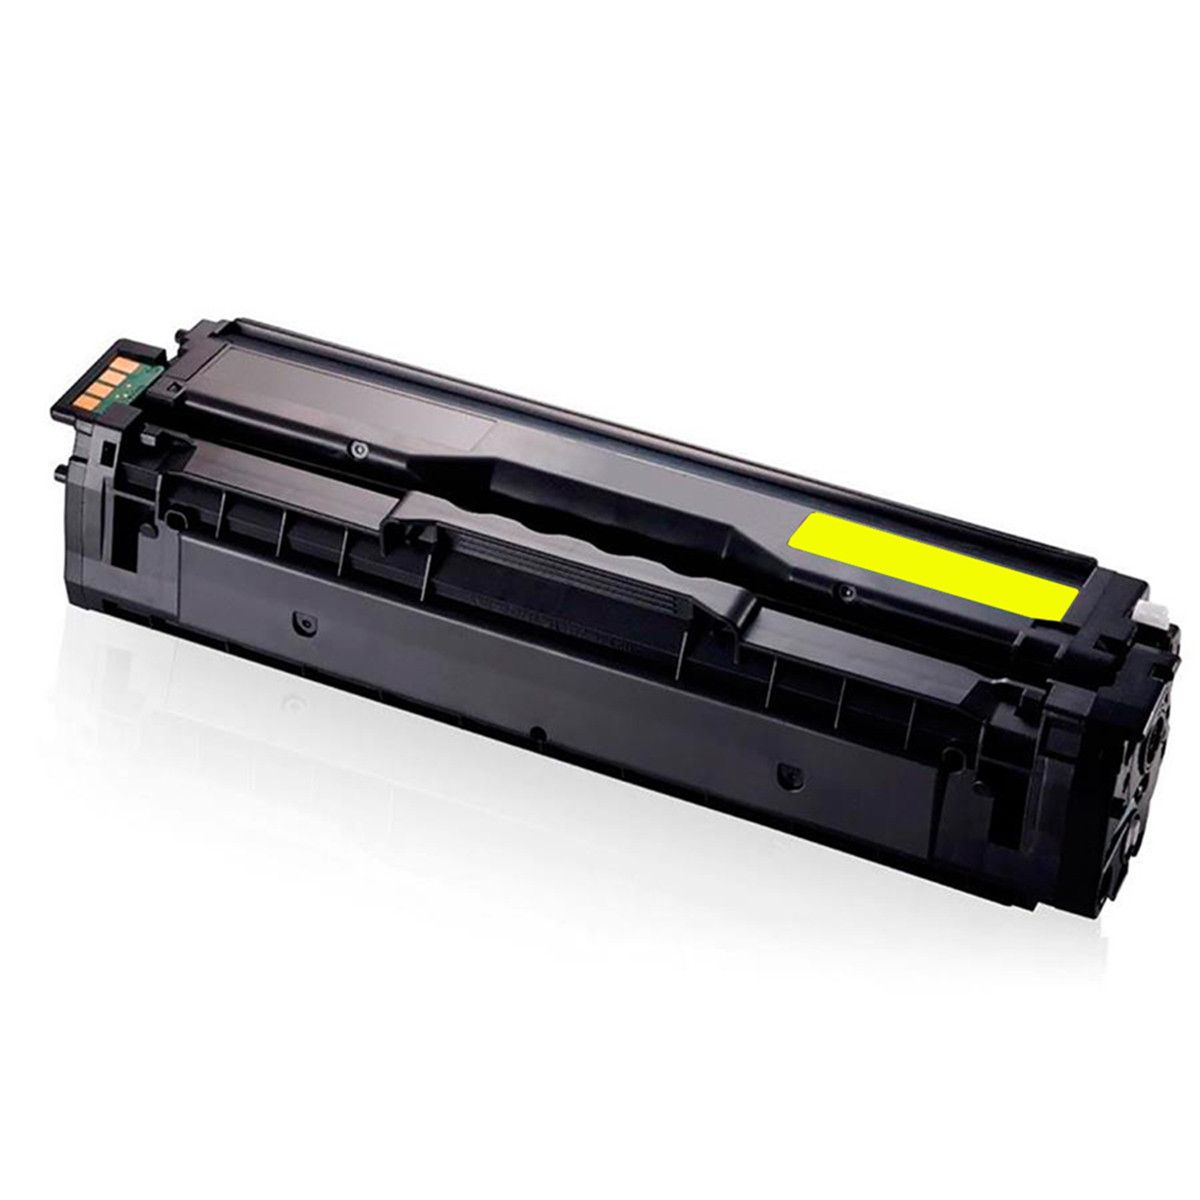 Toner compatível com SAMSUNG CLT-Y504S 504S CLP415NW CLX4195FN SL-C1810W Yellow 1.800 Páginas - Cartucho & Cia